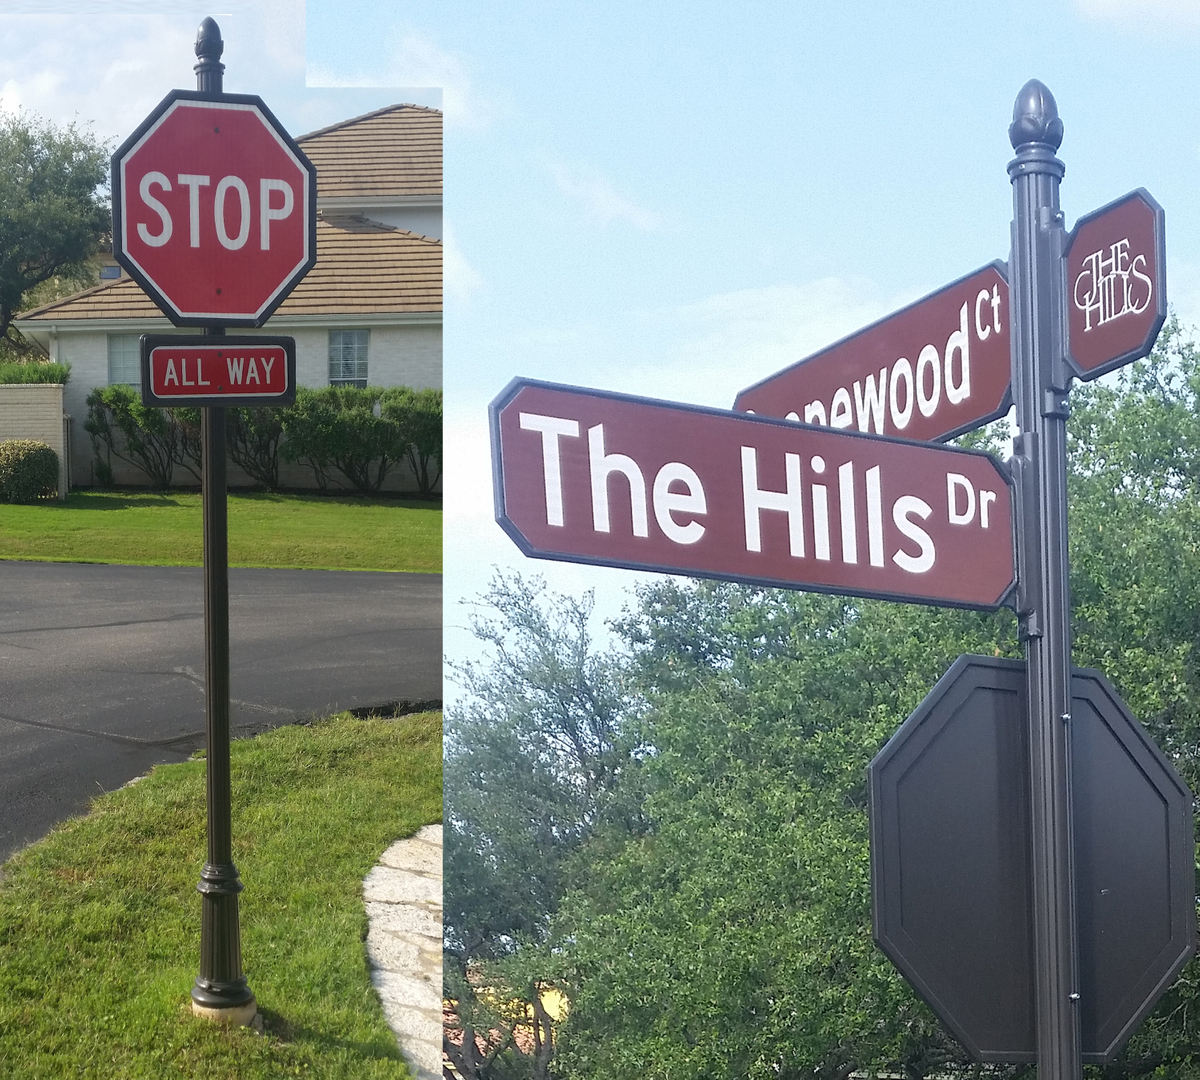 The Hills Neighborhood Street Signs